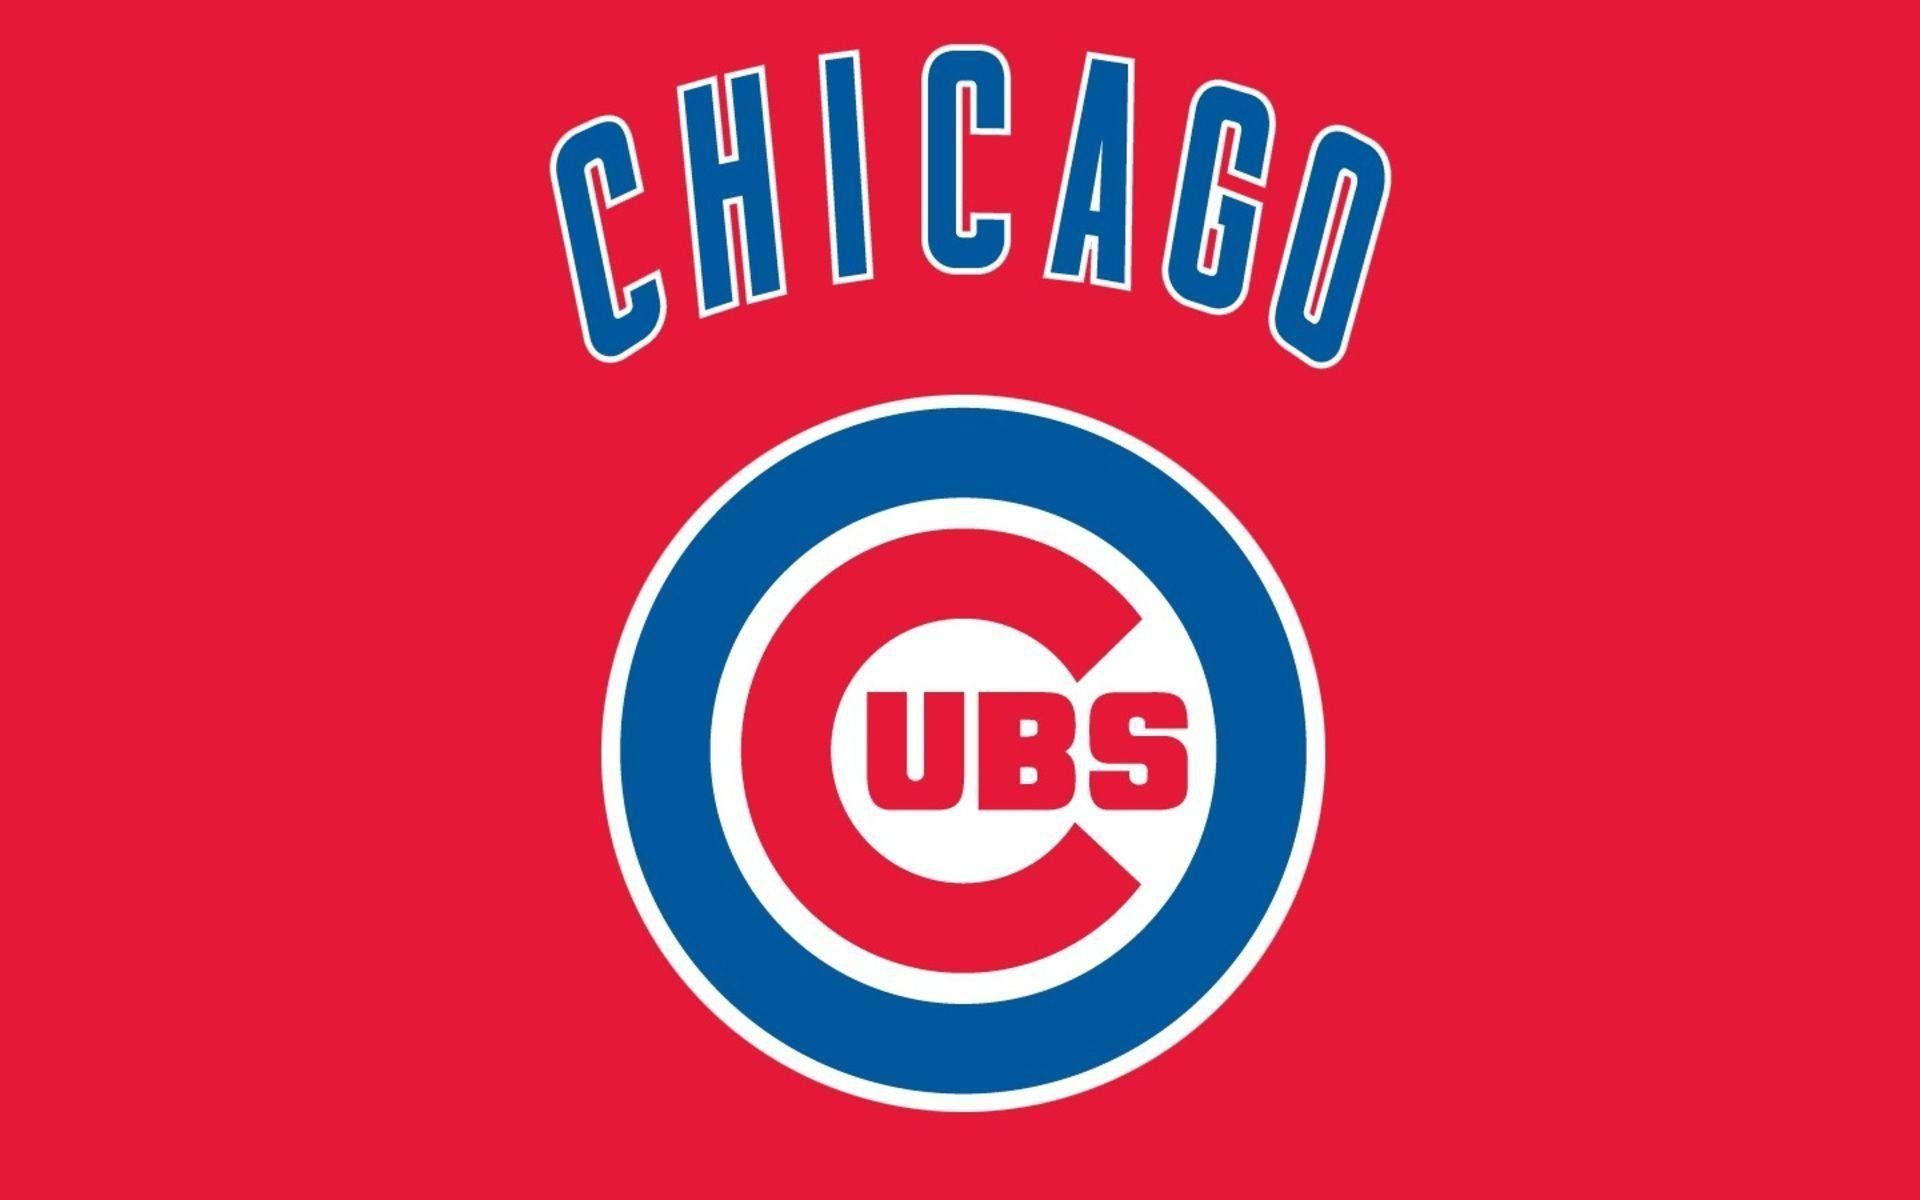 Chicago Cubs Free Baseball Team Wallpaper Chicago Cubs – Wallpaper HD